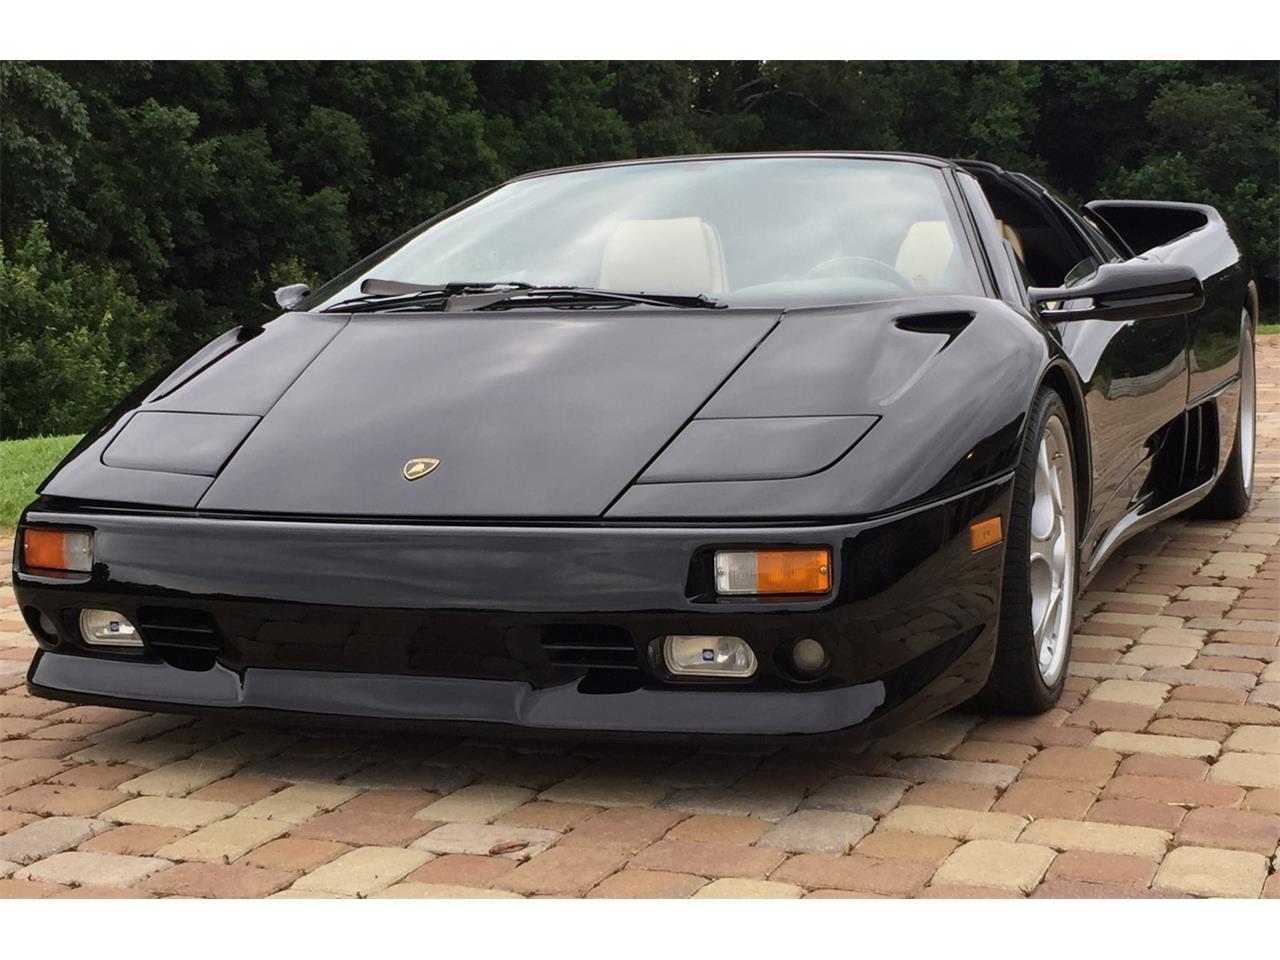 Large Picture of '98 Lamborghini Diablo located in Alpharetta Georgia - $285,000.00 - L4GM